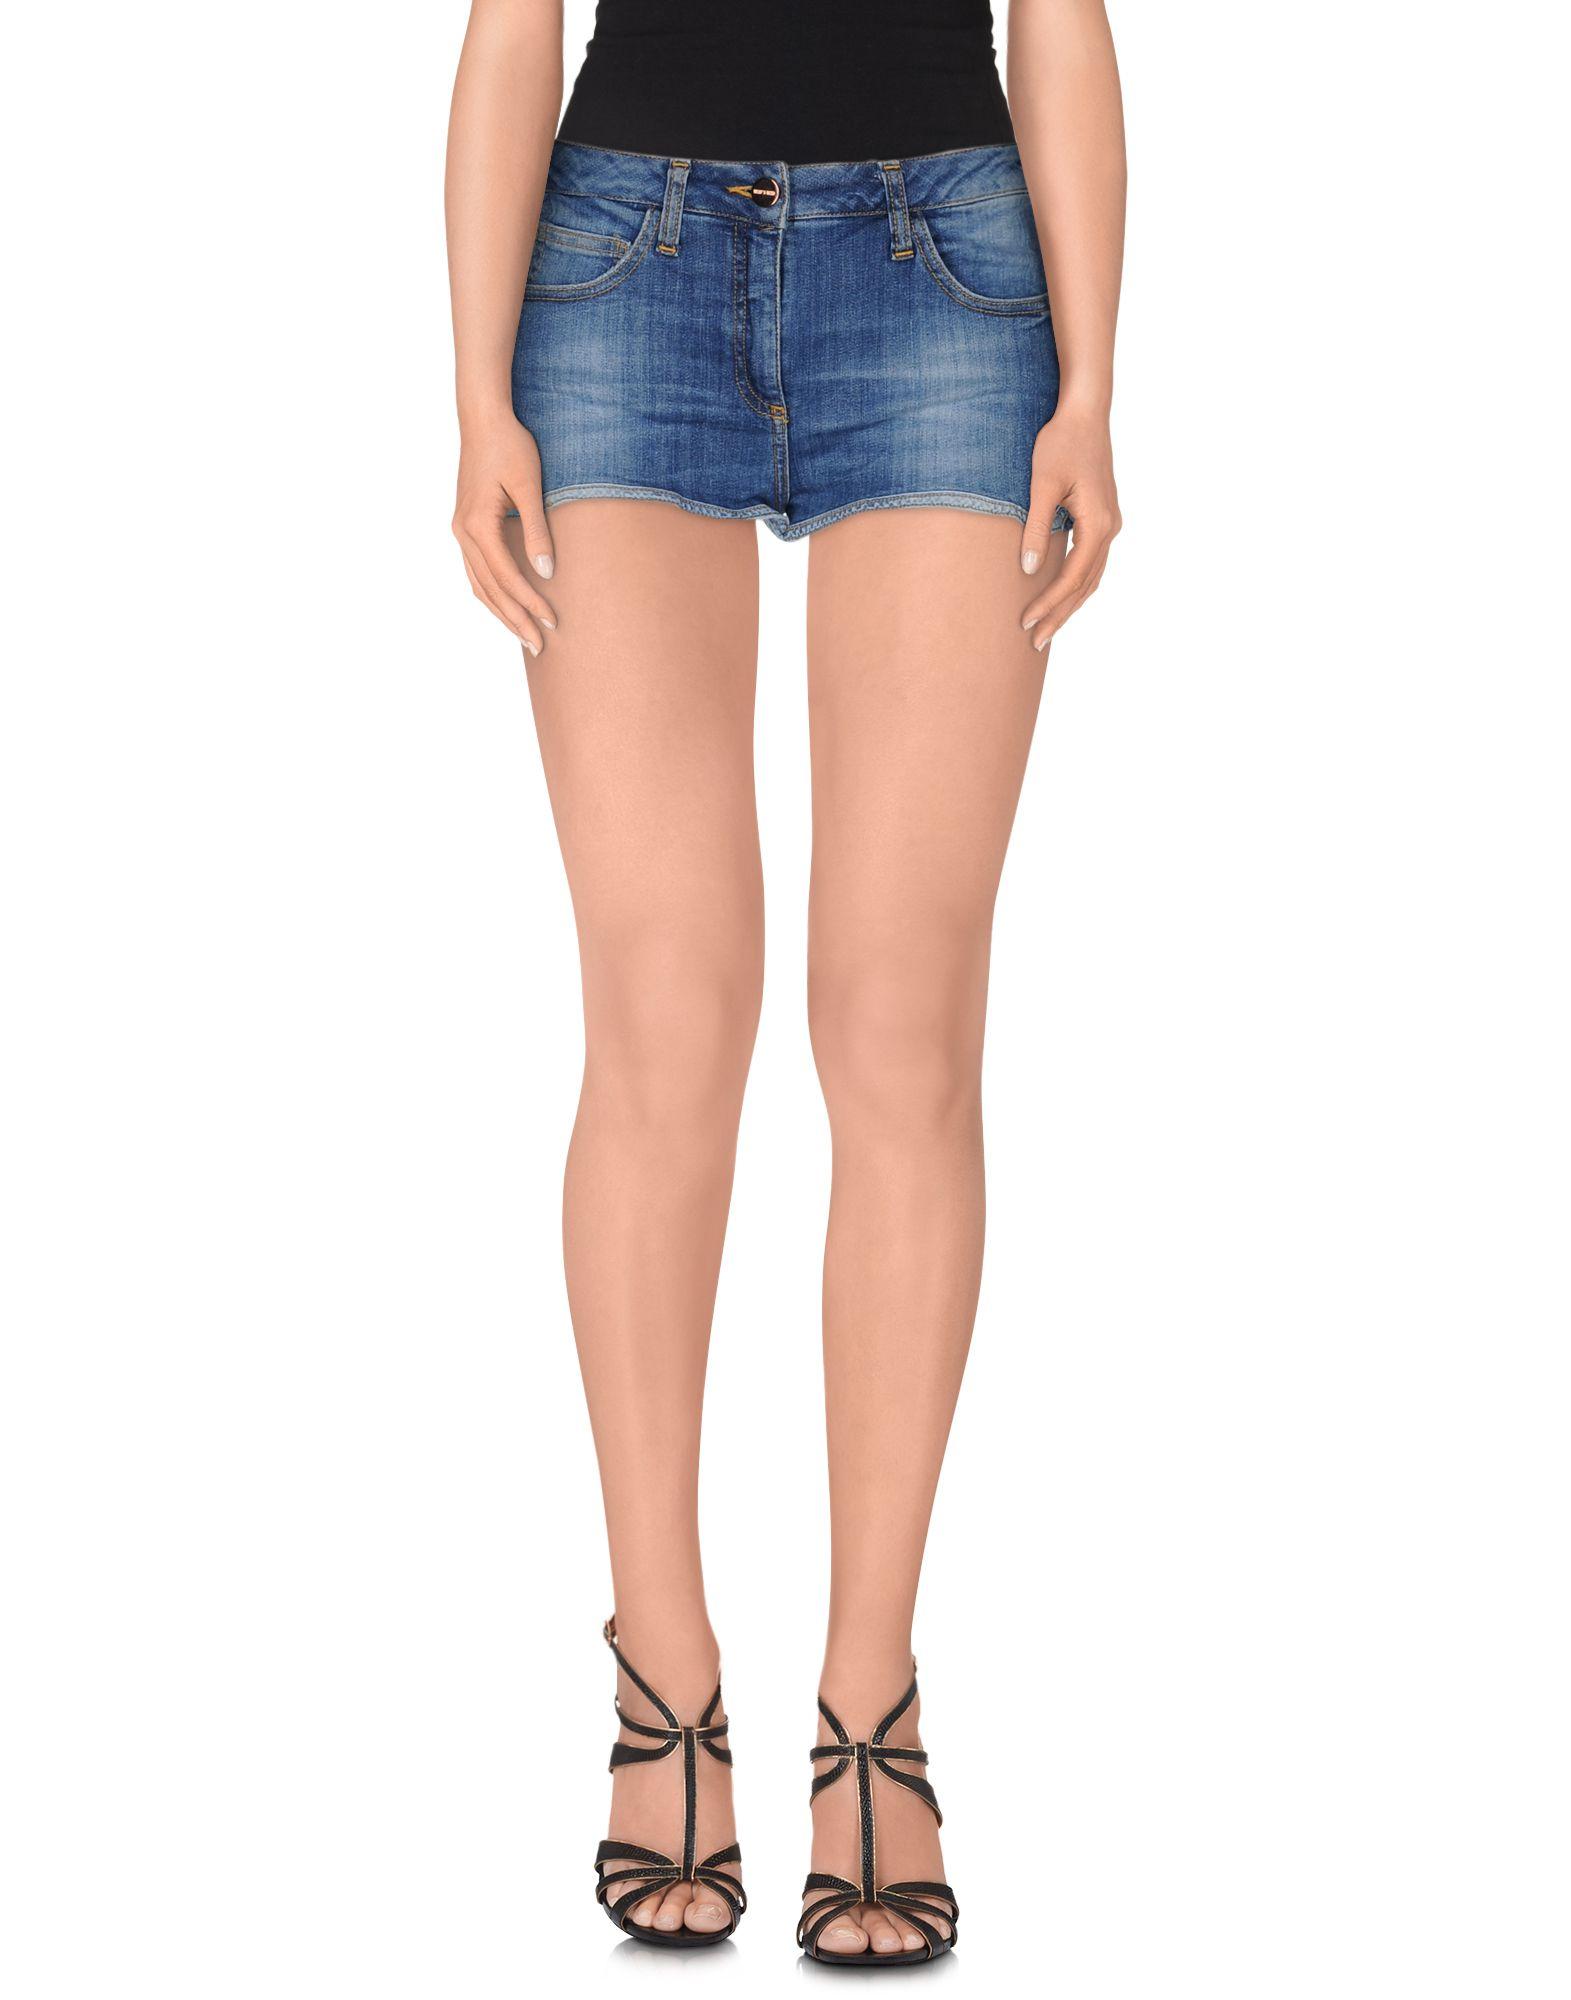 WHO*S WHO Джинсовые шорты шорты henry cotton s шорты